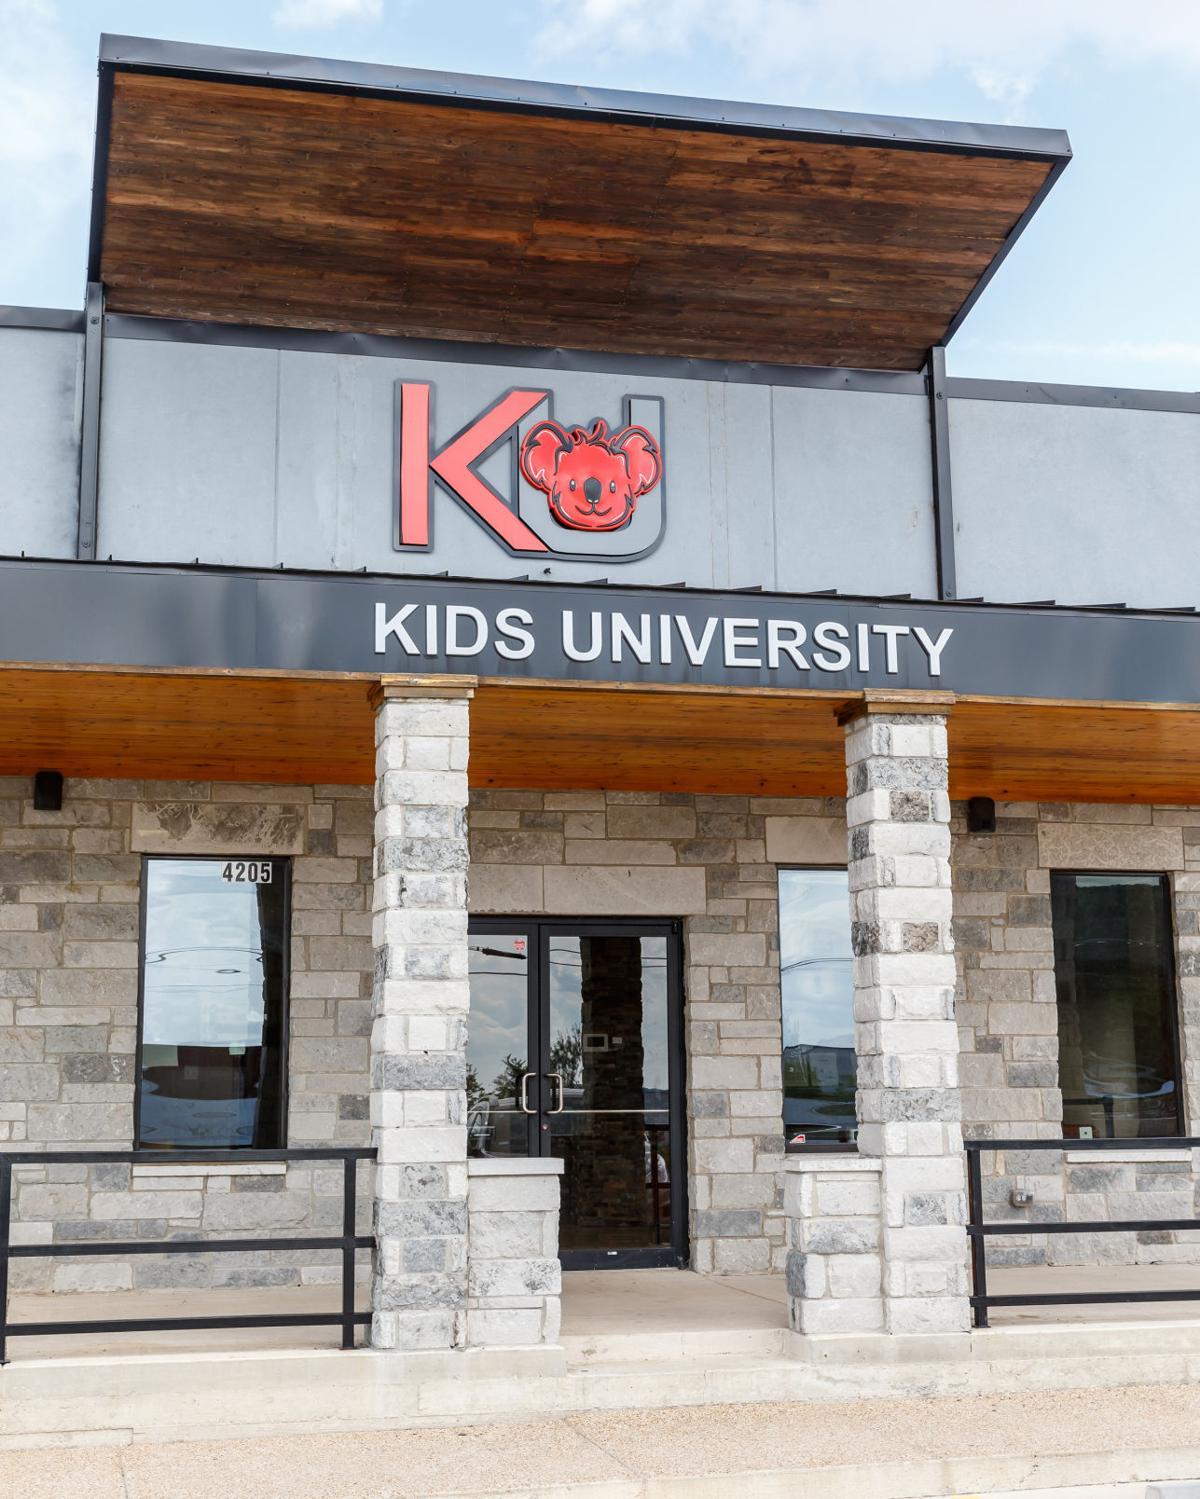 Kidz University